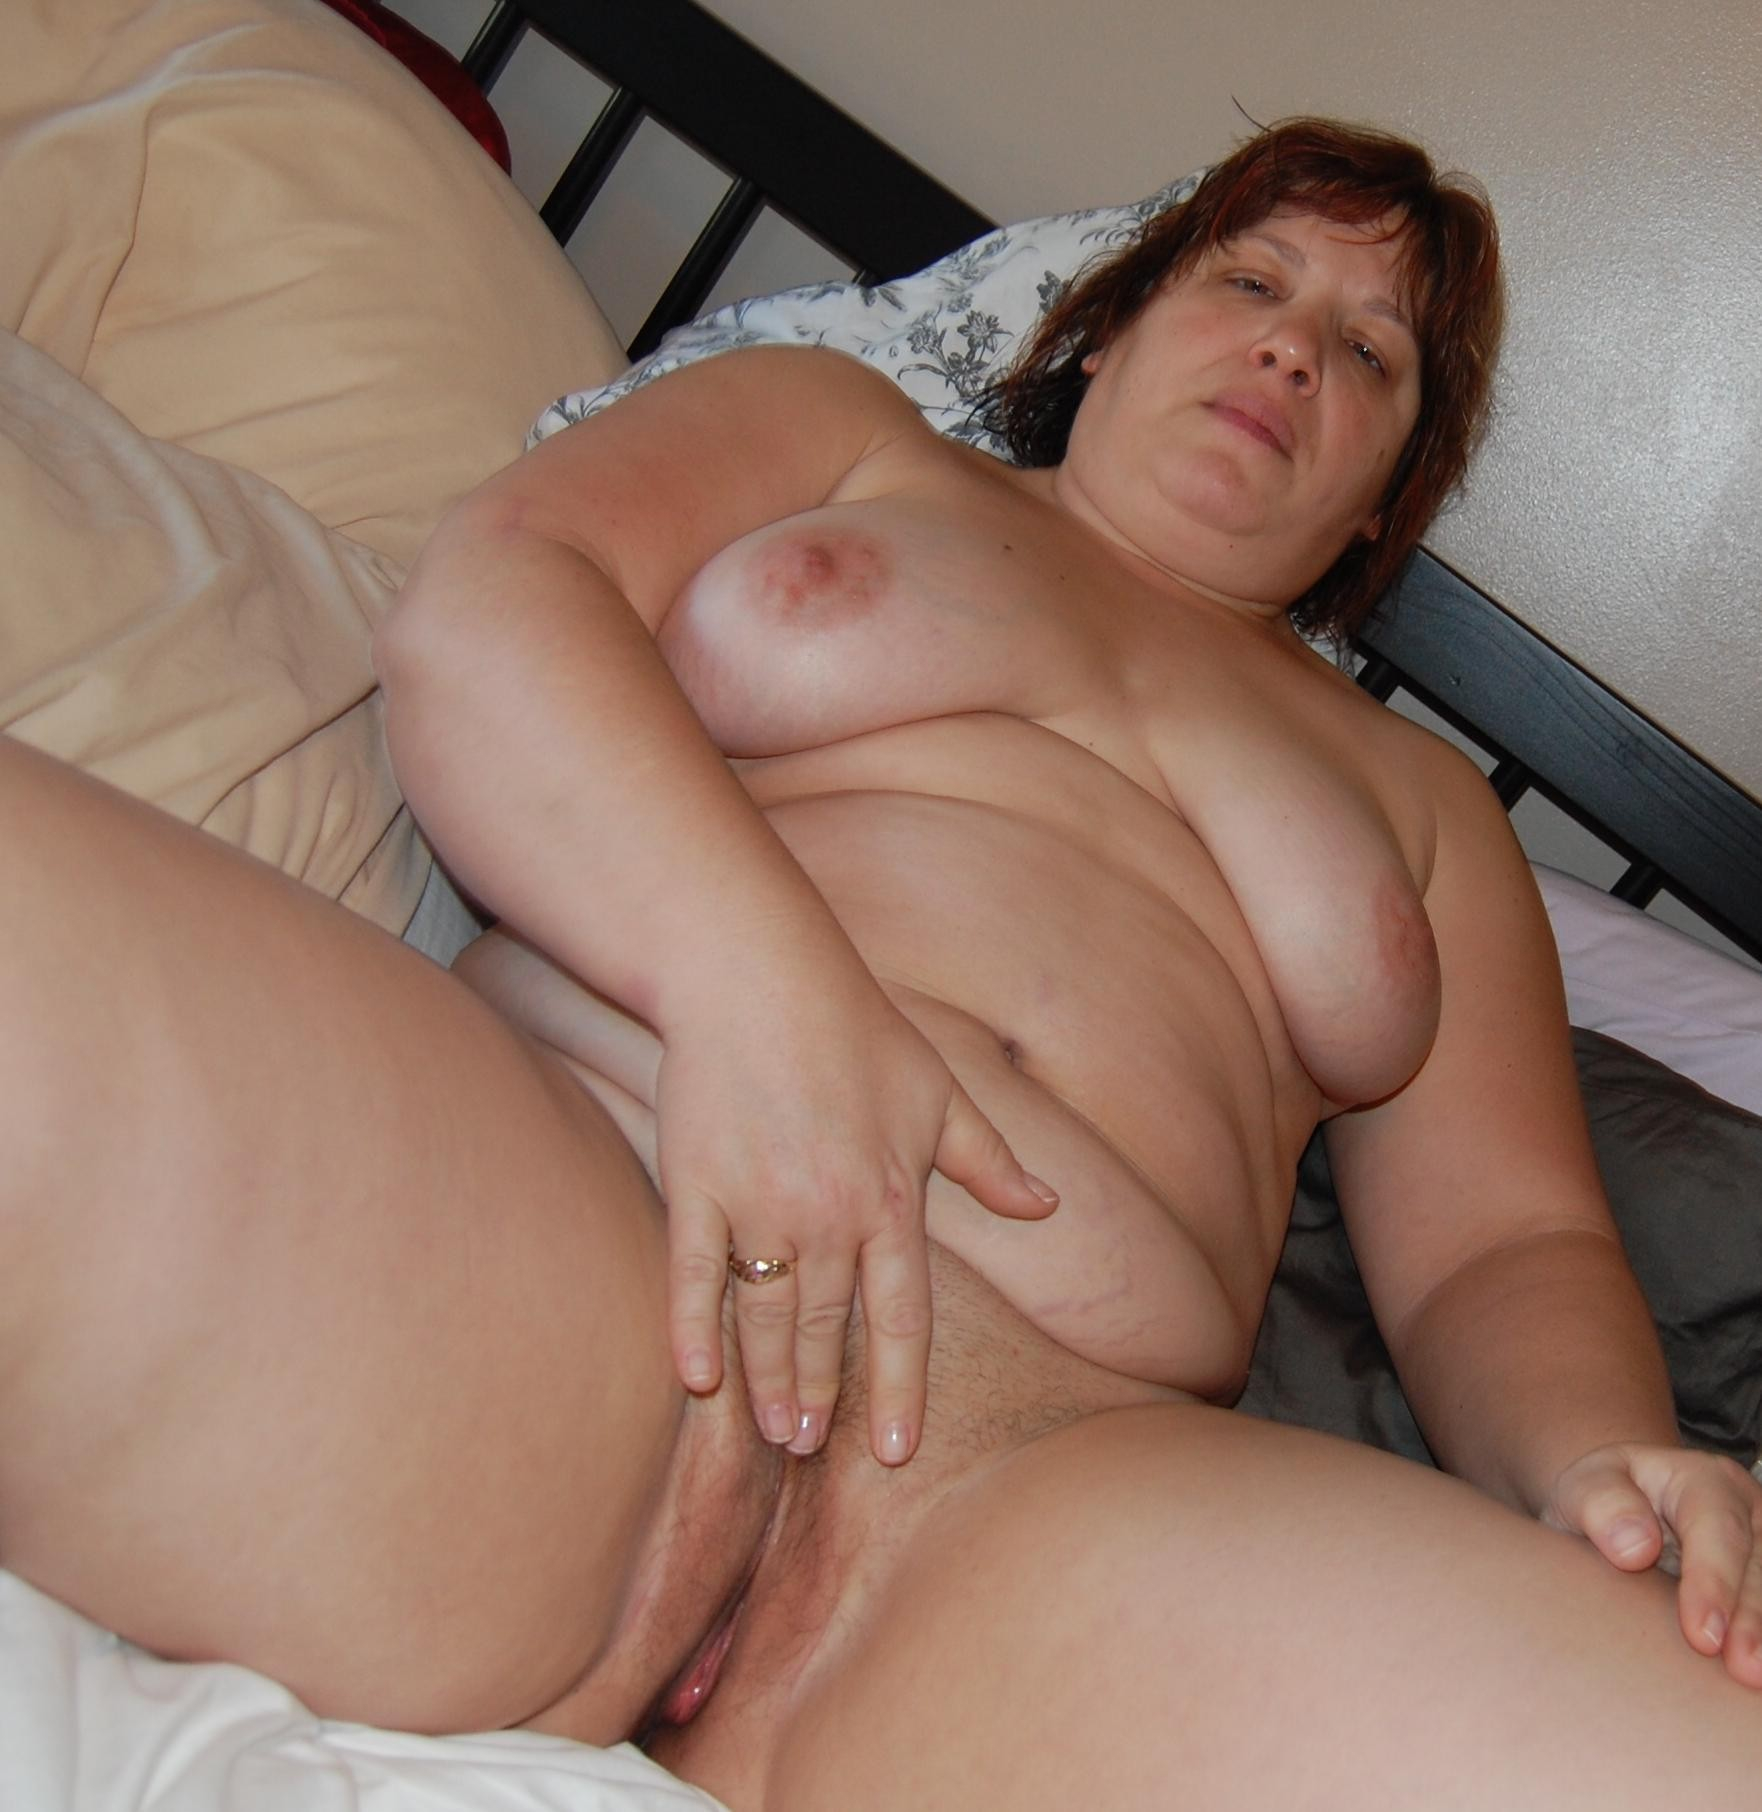 пышка мастурбирует порно фото